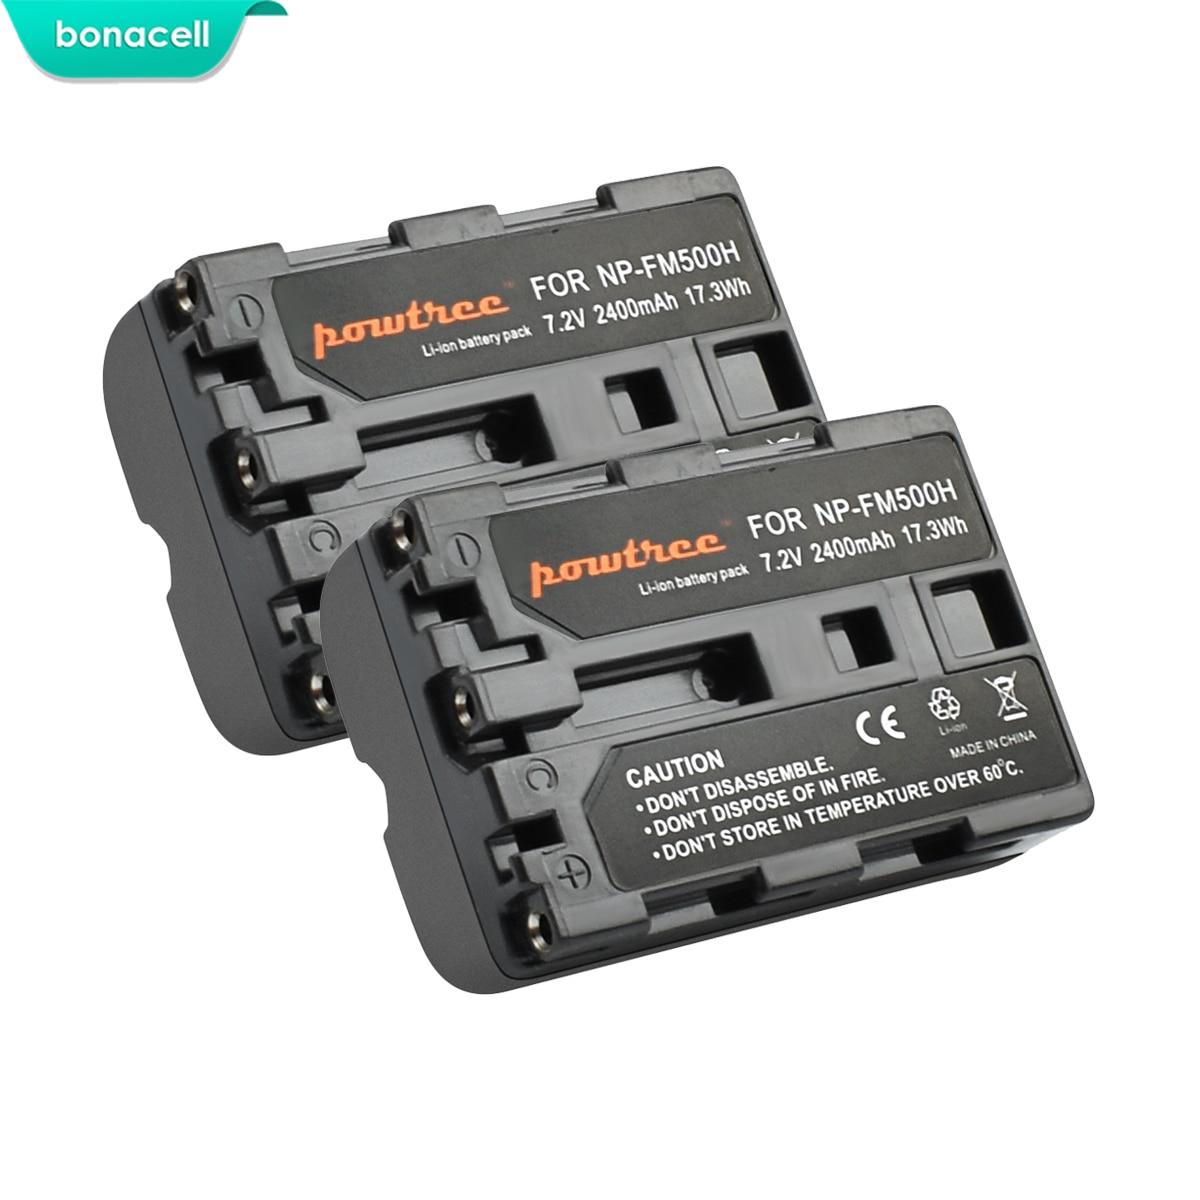 Unterhaltungselektronik 4x Bateria Np-bx1 Npbx1 Np Bx1 Batterie Für Sony Dsc-rx100 Dsc-wx500 Hx300 Wx300 Hdr As100v As200v As15 As30v As300 M3 M2 Hx60 Rabatte Verkauf Stromquelle